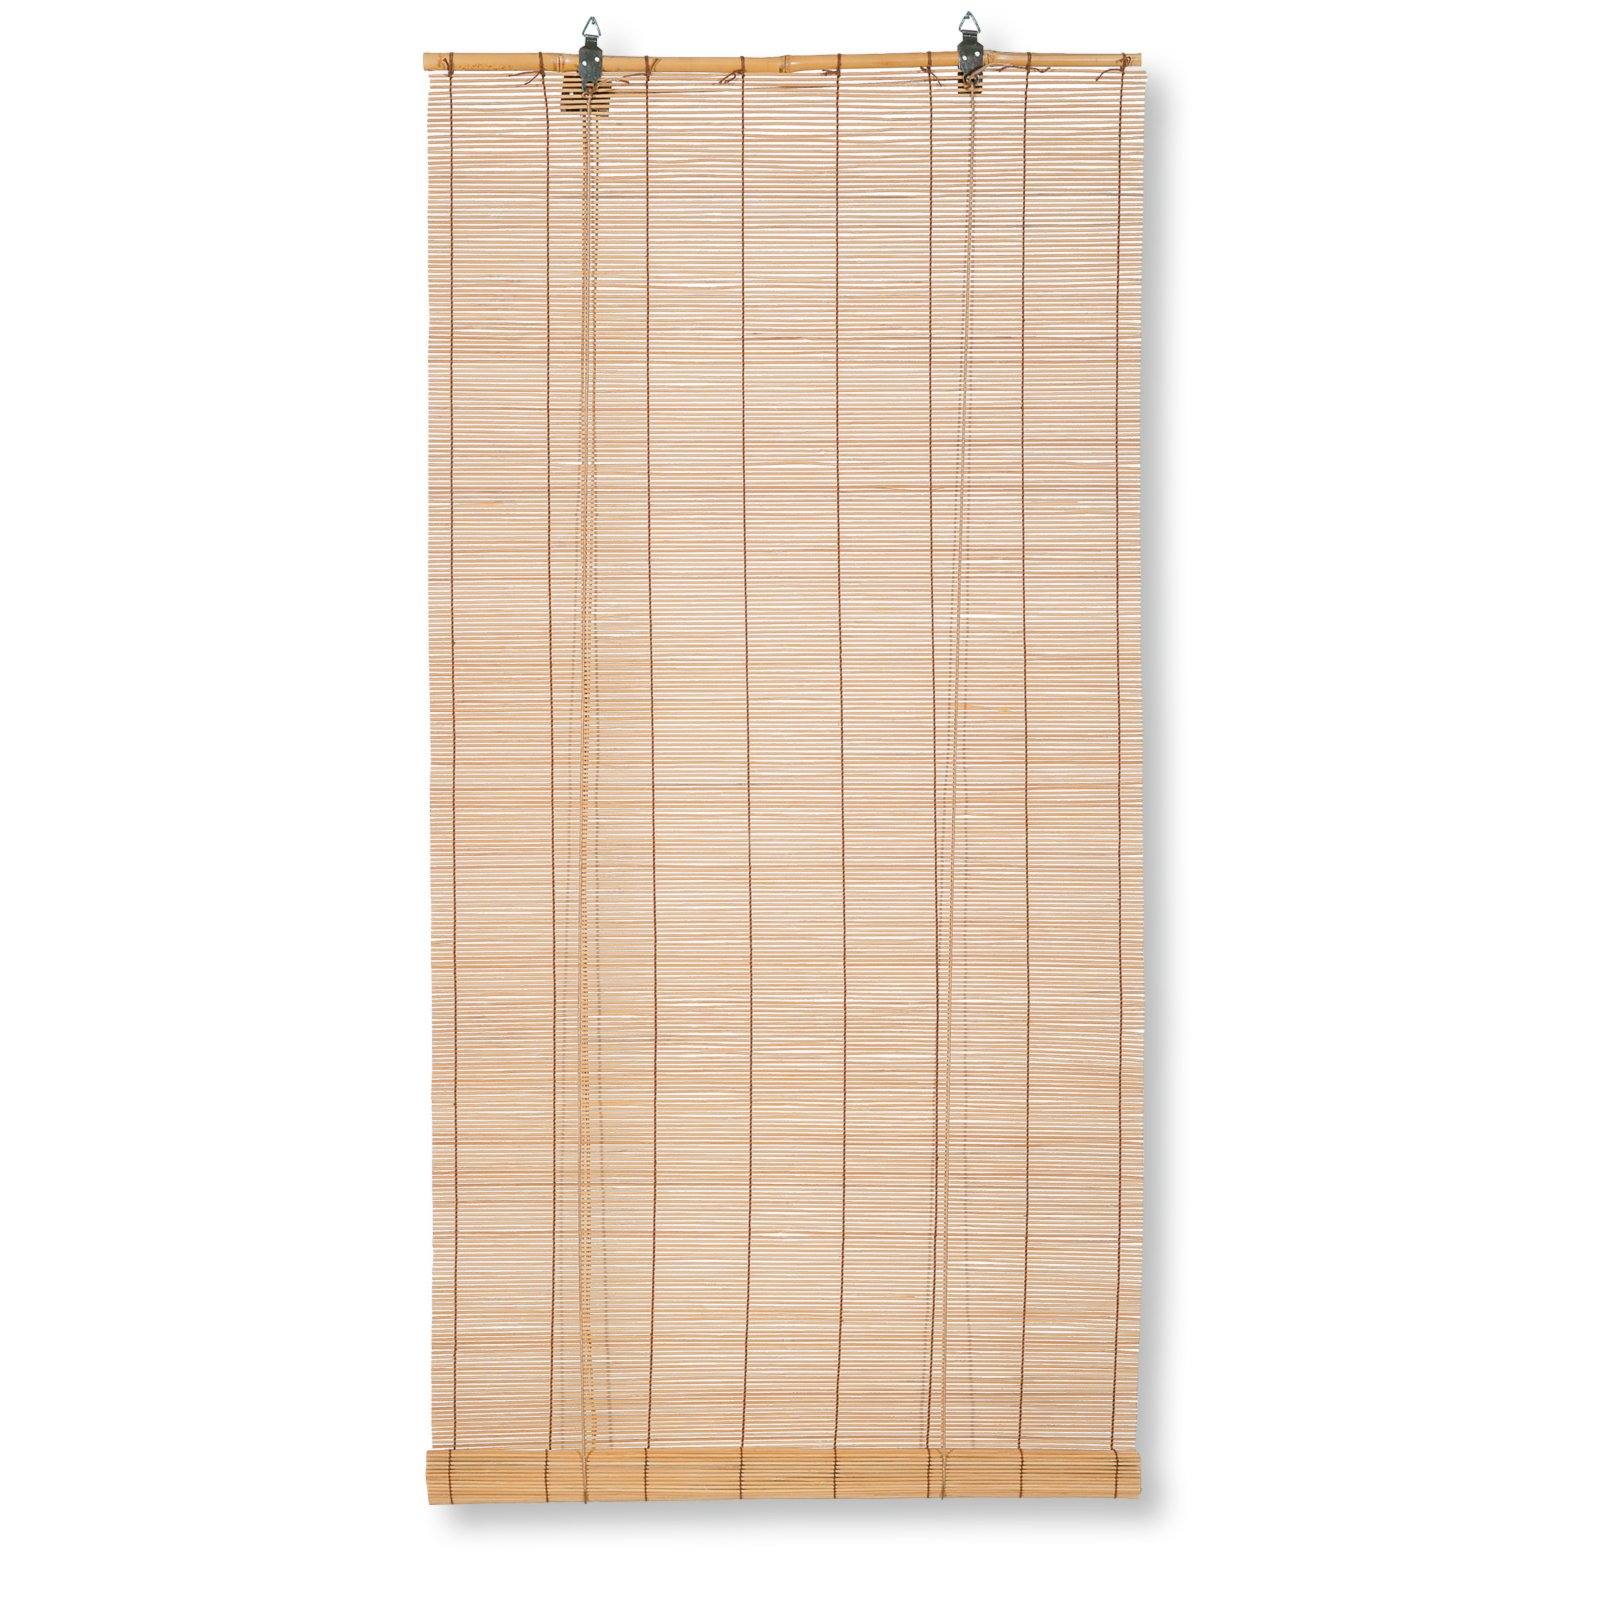 bambus raffrollo hellbraun 60x160 cm bambusrollos rollos jalousien deko haushalt. Black Bedroom Furniture Sets. Home Design Ideas